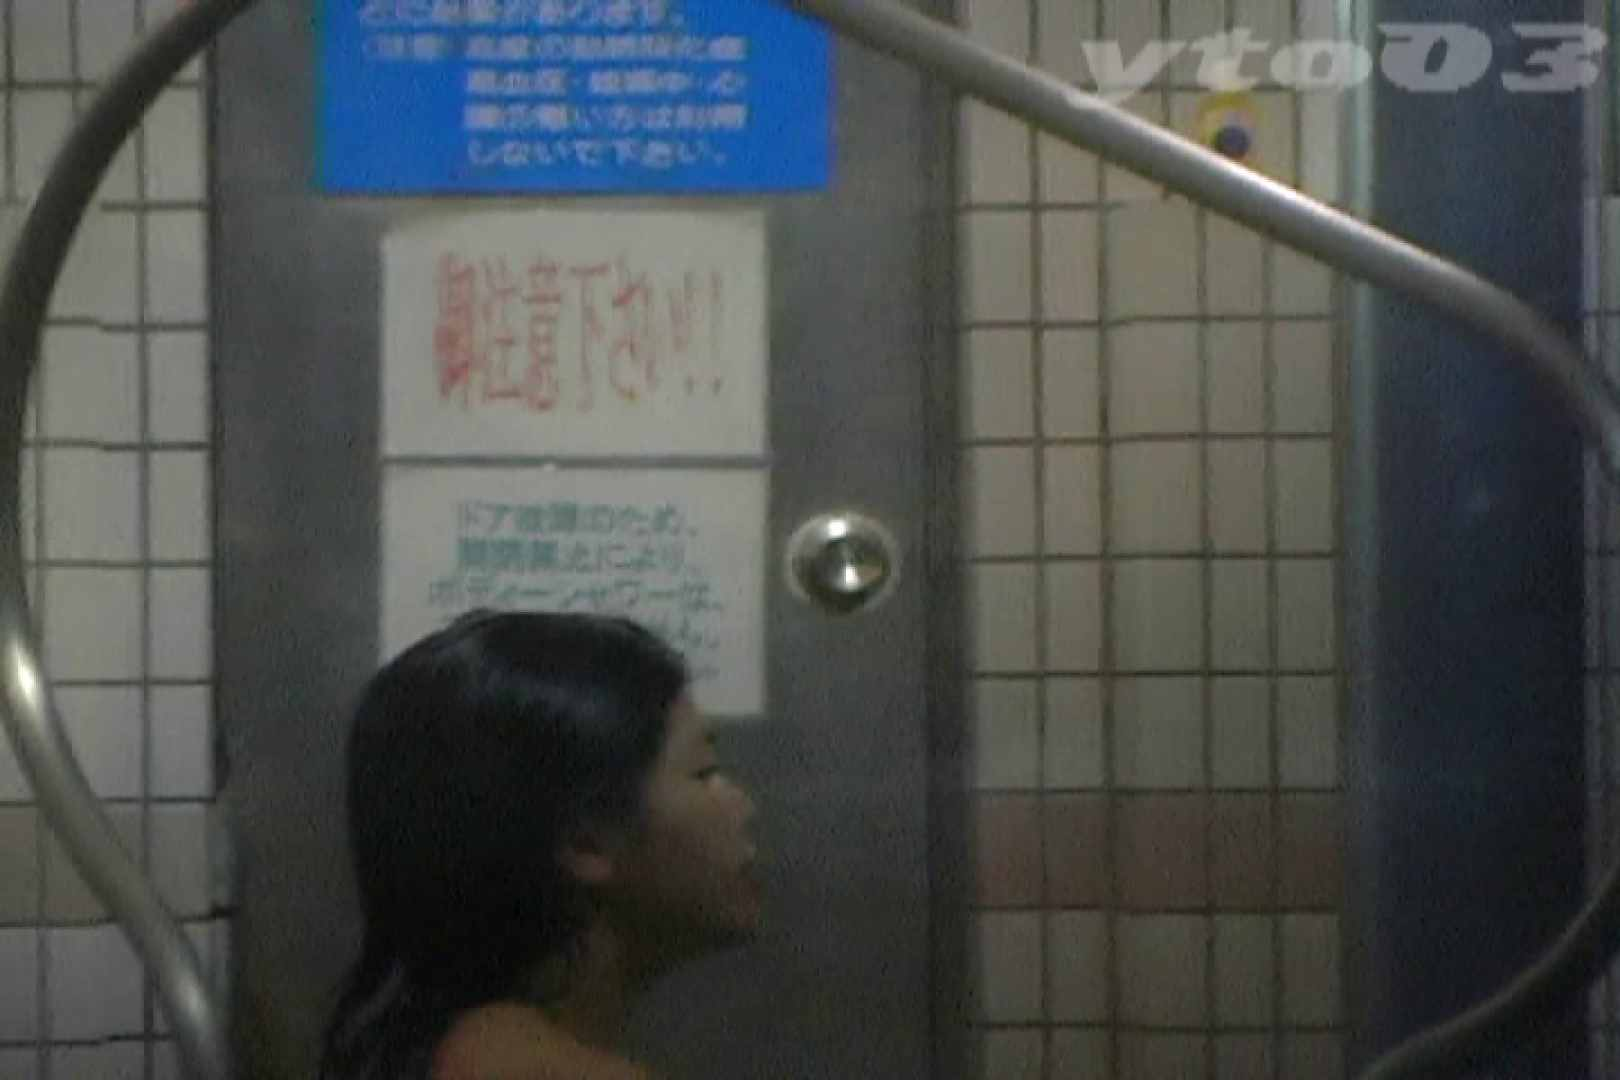 ▲復活限定▲合宿ホテル女風呂盗撮 Vol.17 合宿中の出来事 盗撮 100画像 72